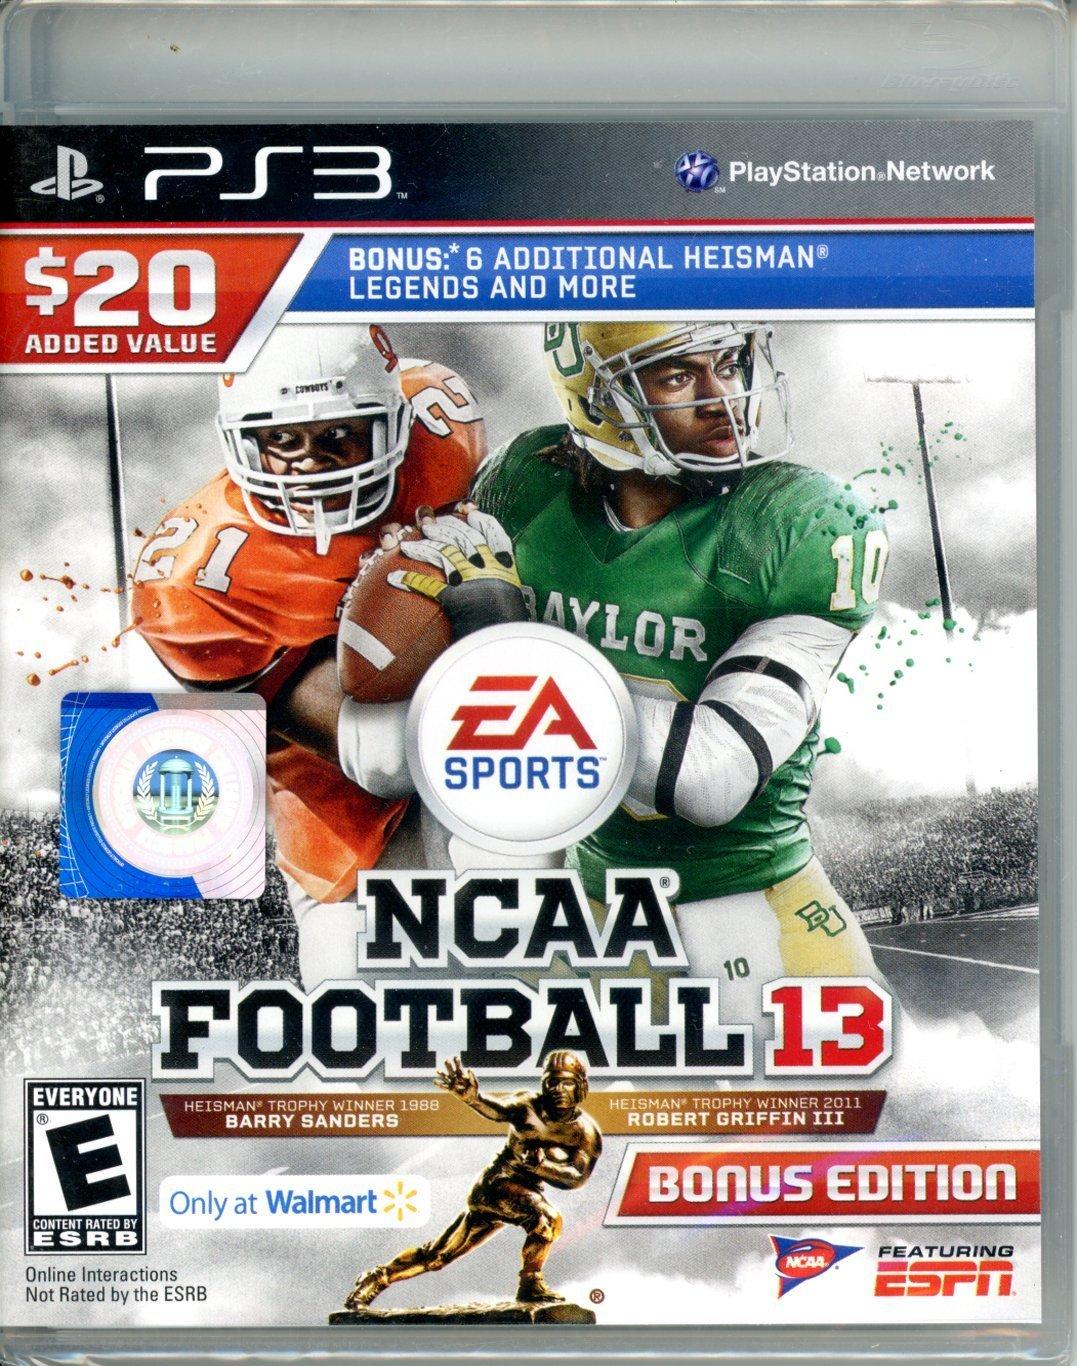 NCAA B06Y5TW11S Football 13 Bonus Edition - - 6 Edition Heisman Legends [並行輸入品] B06Y5TW11S, 坂戸市:eb0bd071 --- m2cweb.com